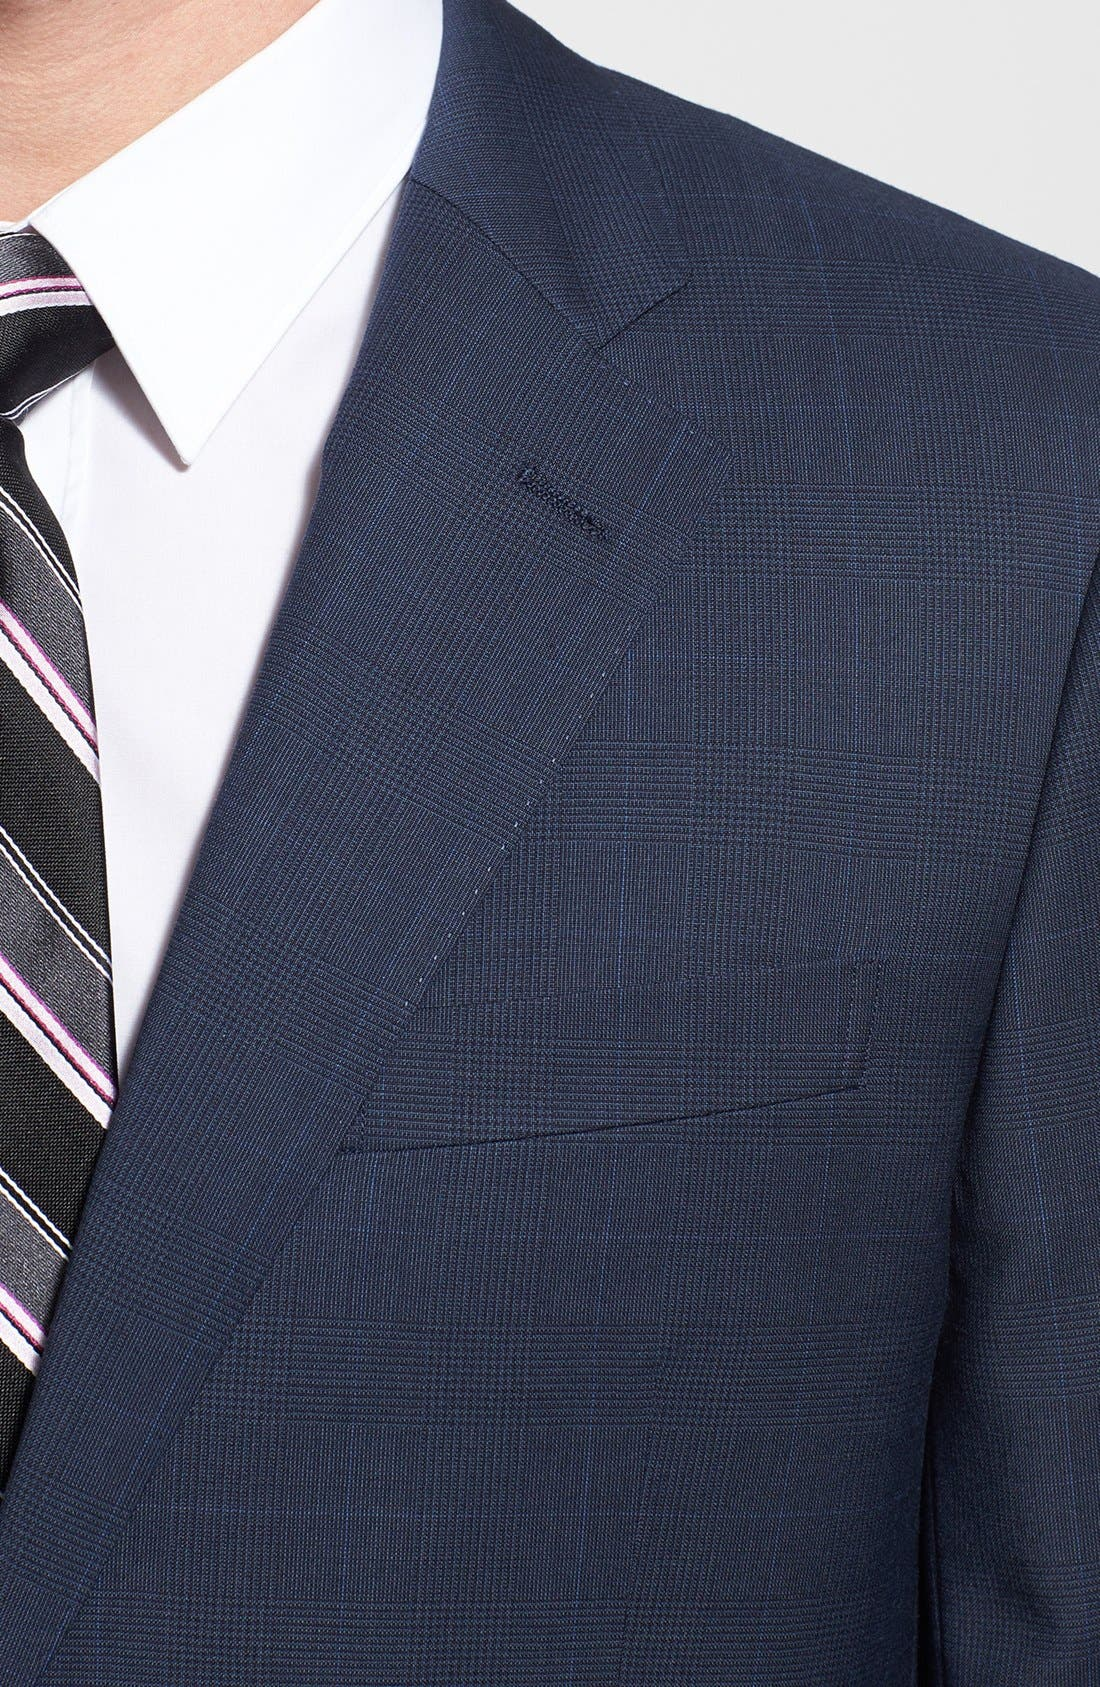 Alternate Image 4  - John W. Nordstrom® Classic Fit Windowpane Wrinkle Free Travel Suit